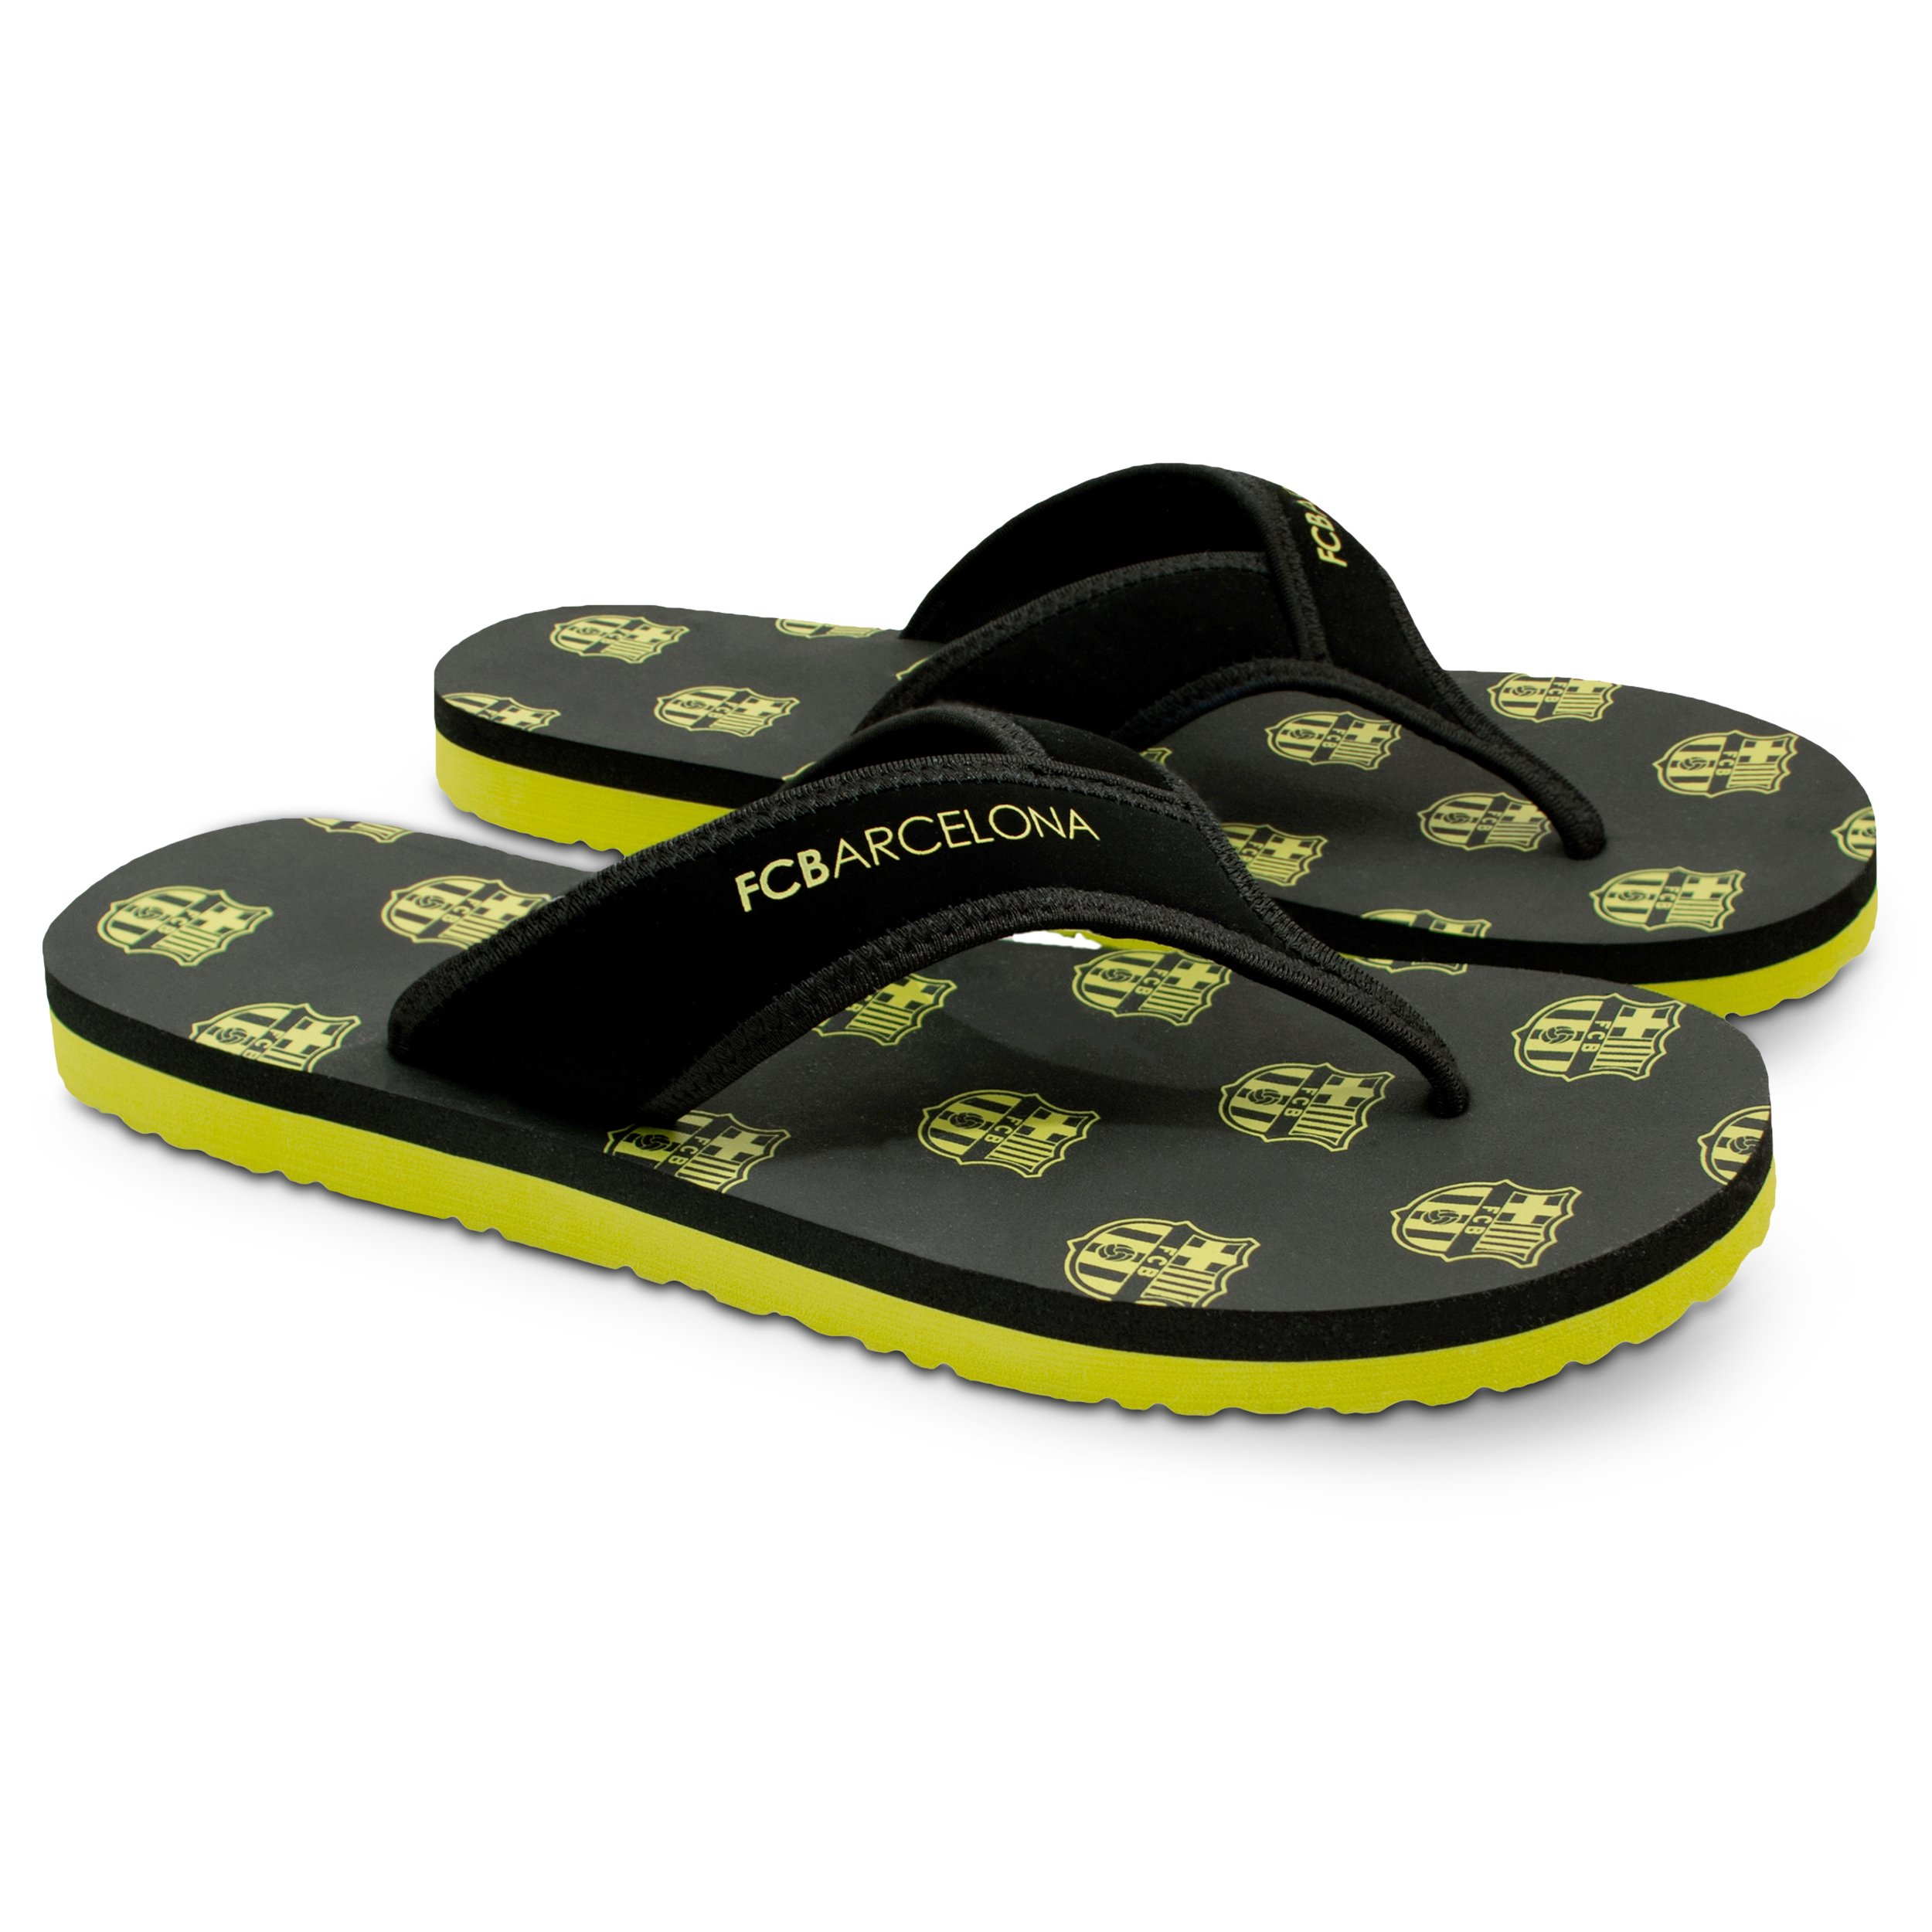 FC Barcelona Men Flip-Flop Sandal – Water-Resistant Slippers for Pool & Beach